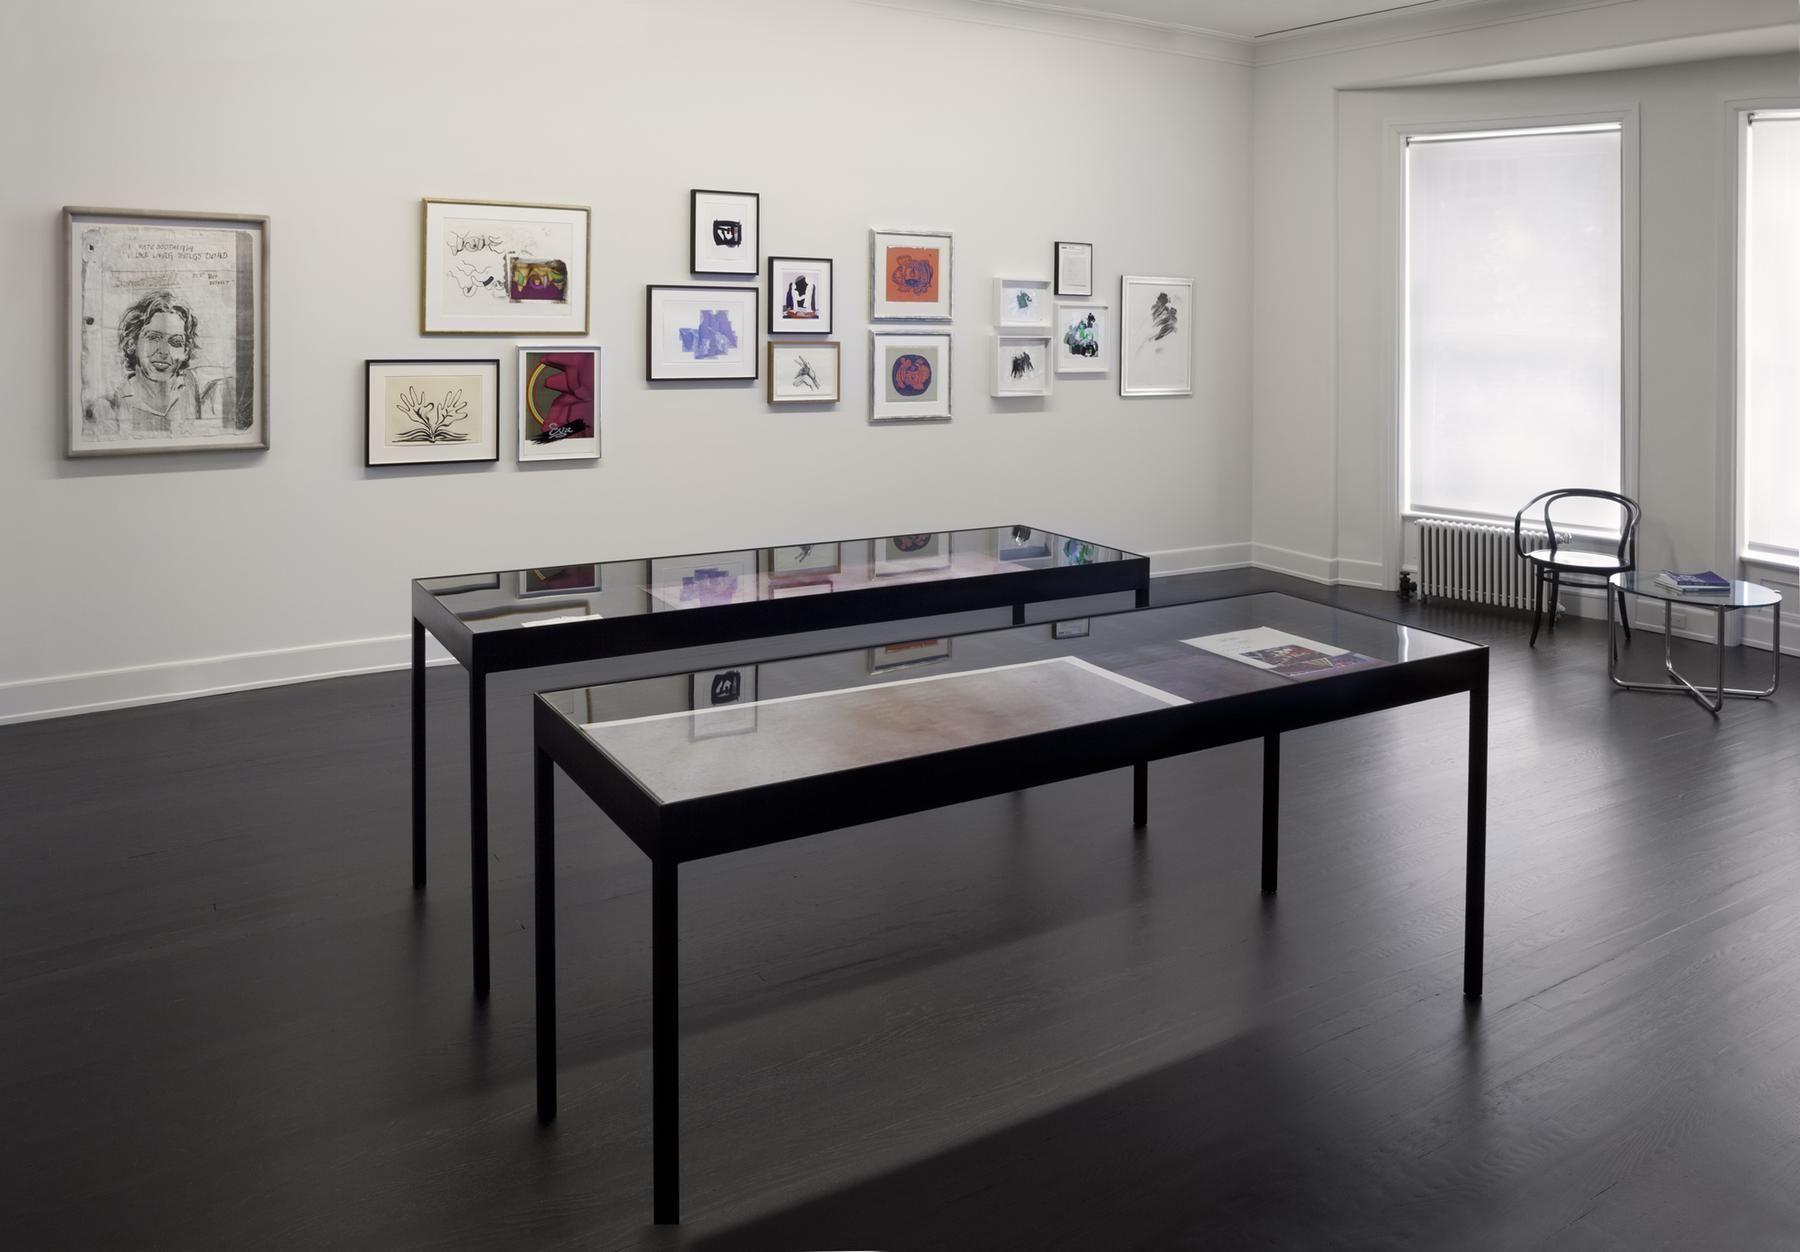 Seth Price Drawings: Studies for Works 2000-2015